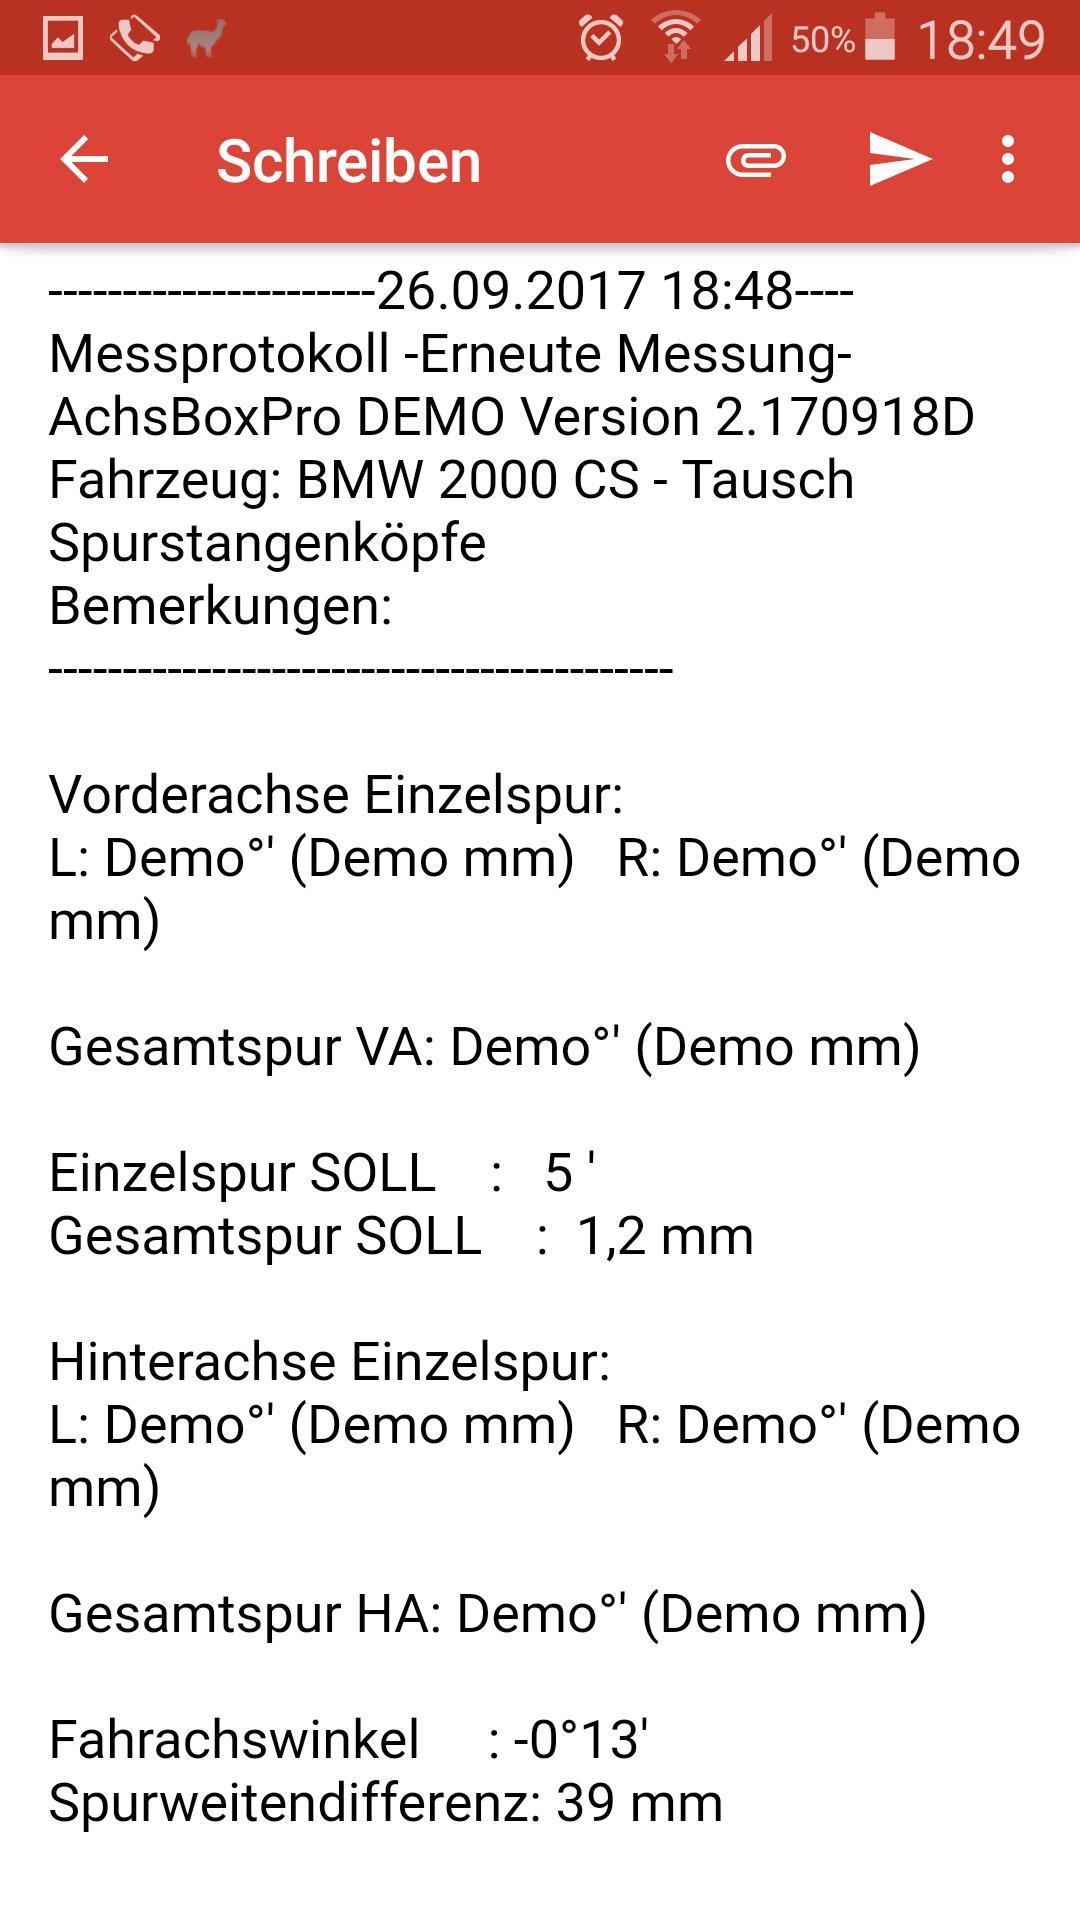 AchsBoxPro Demo Achsvermessung free poster